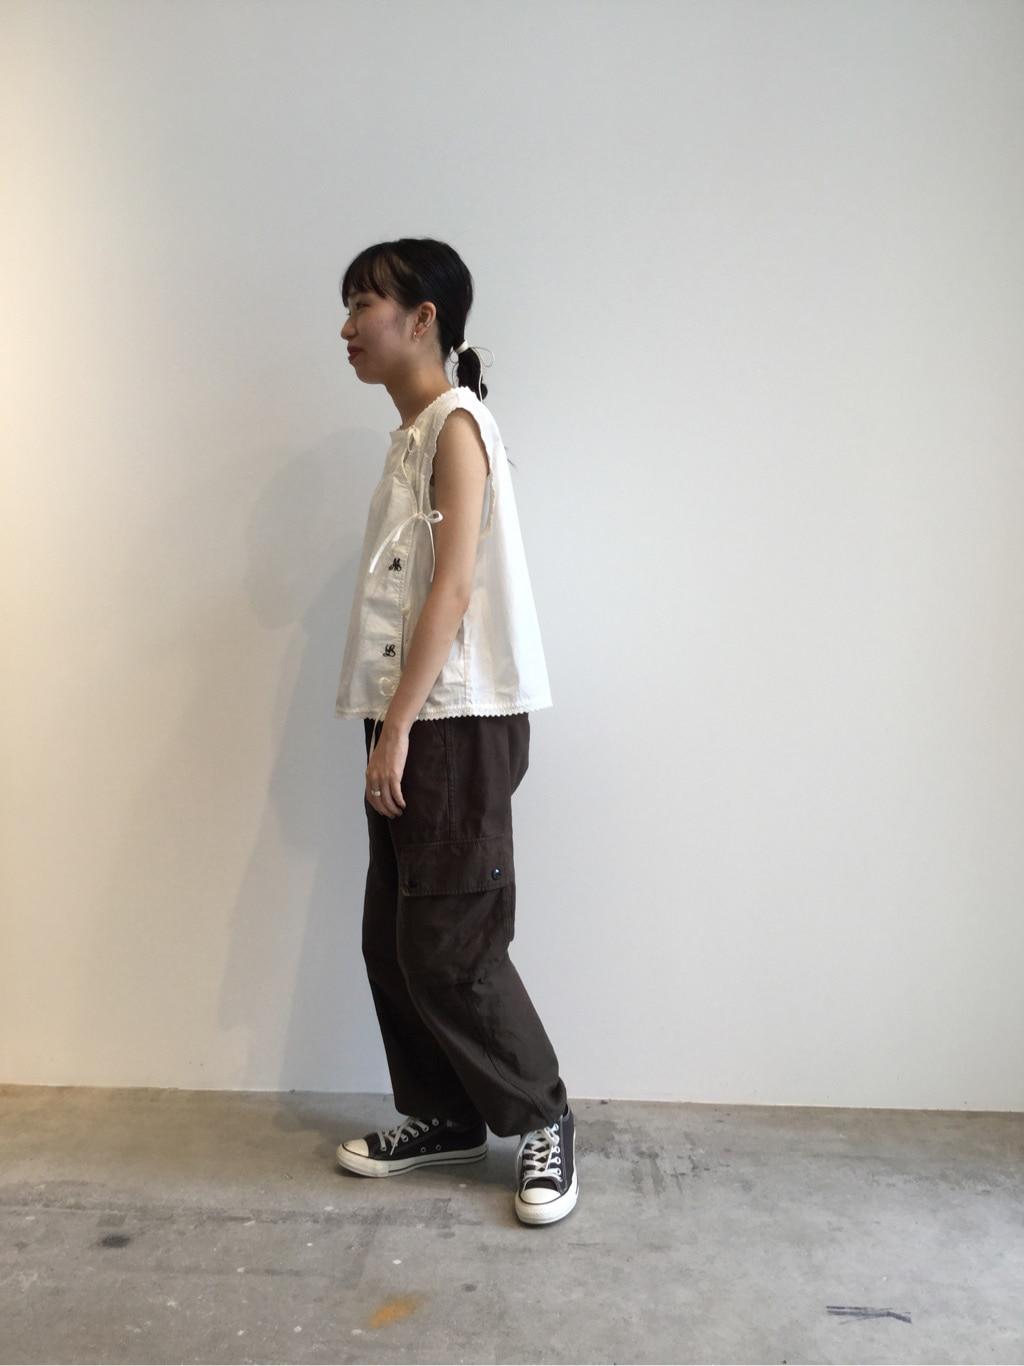 AMB SHOP bulle de savon FLAT AMB 名古屋栄路面 身長:152cm 2020.07.21